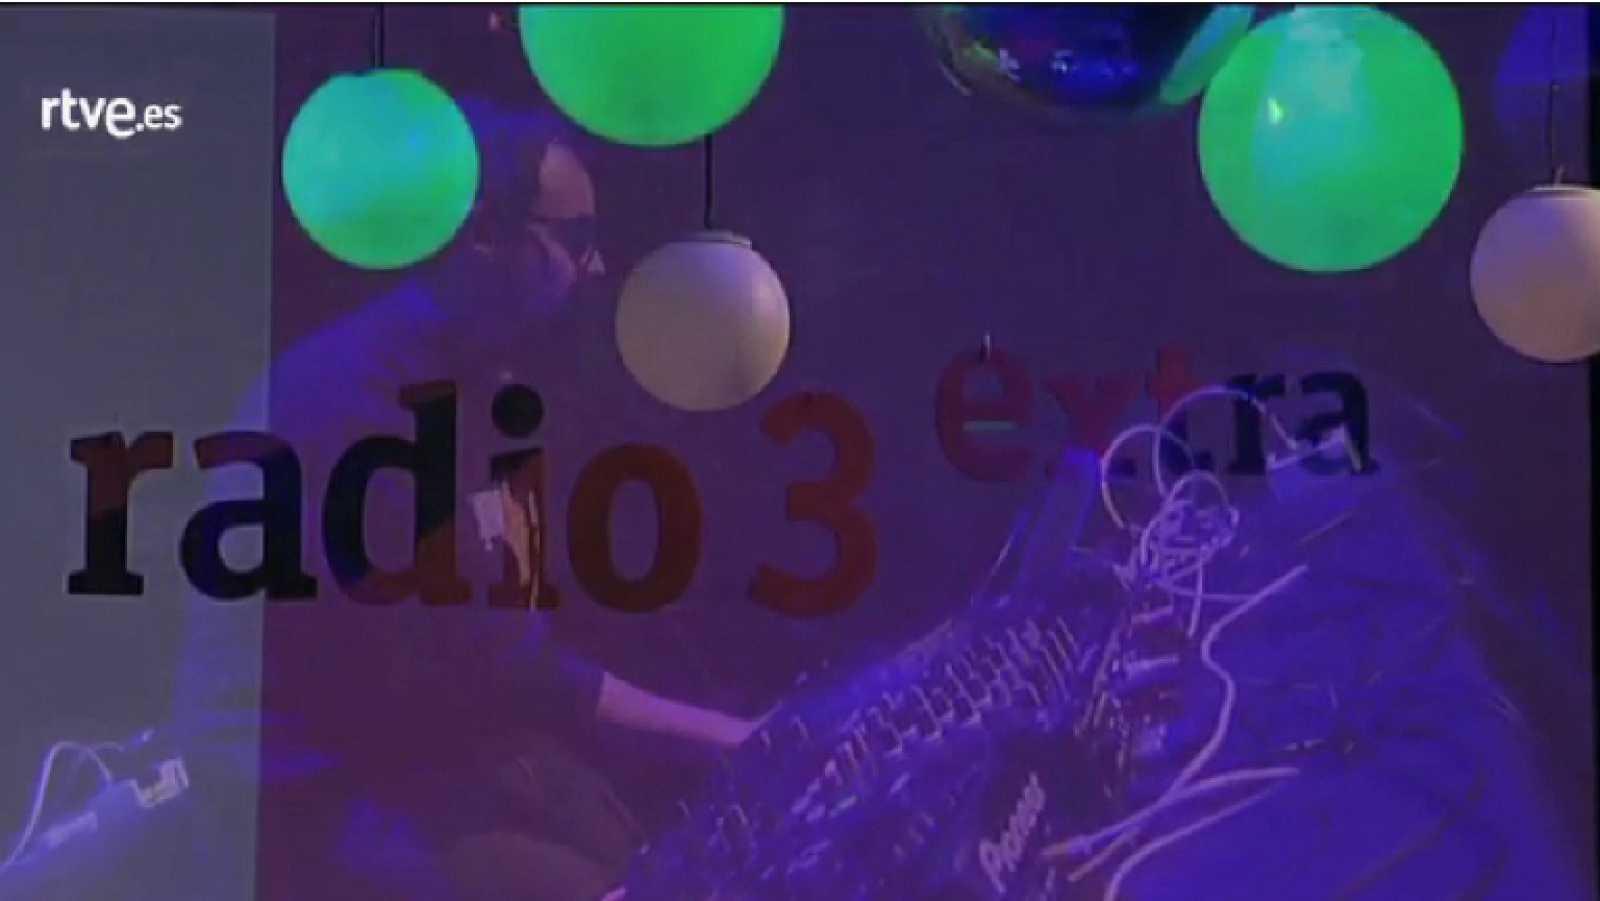 Radio3Extra - Vídeo fiesta Radio3Extra - 12/02/14 Ver ahora